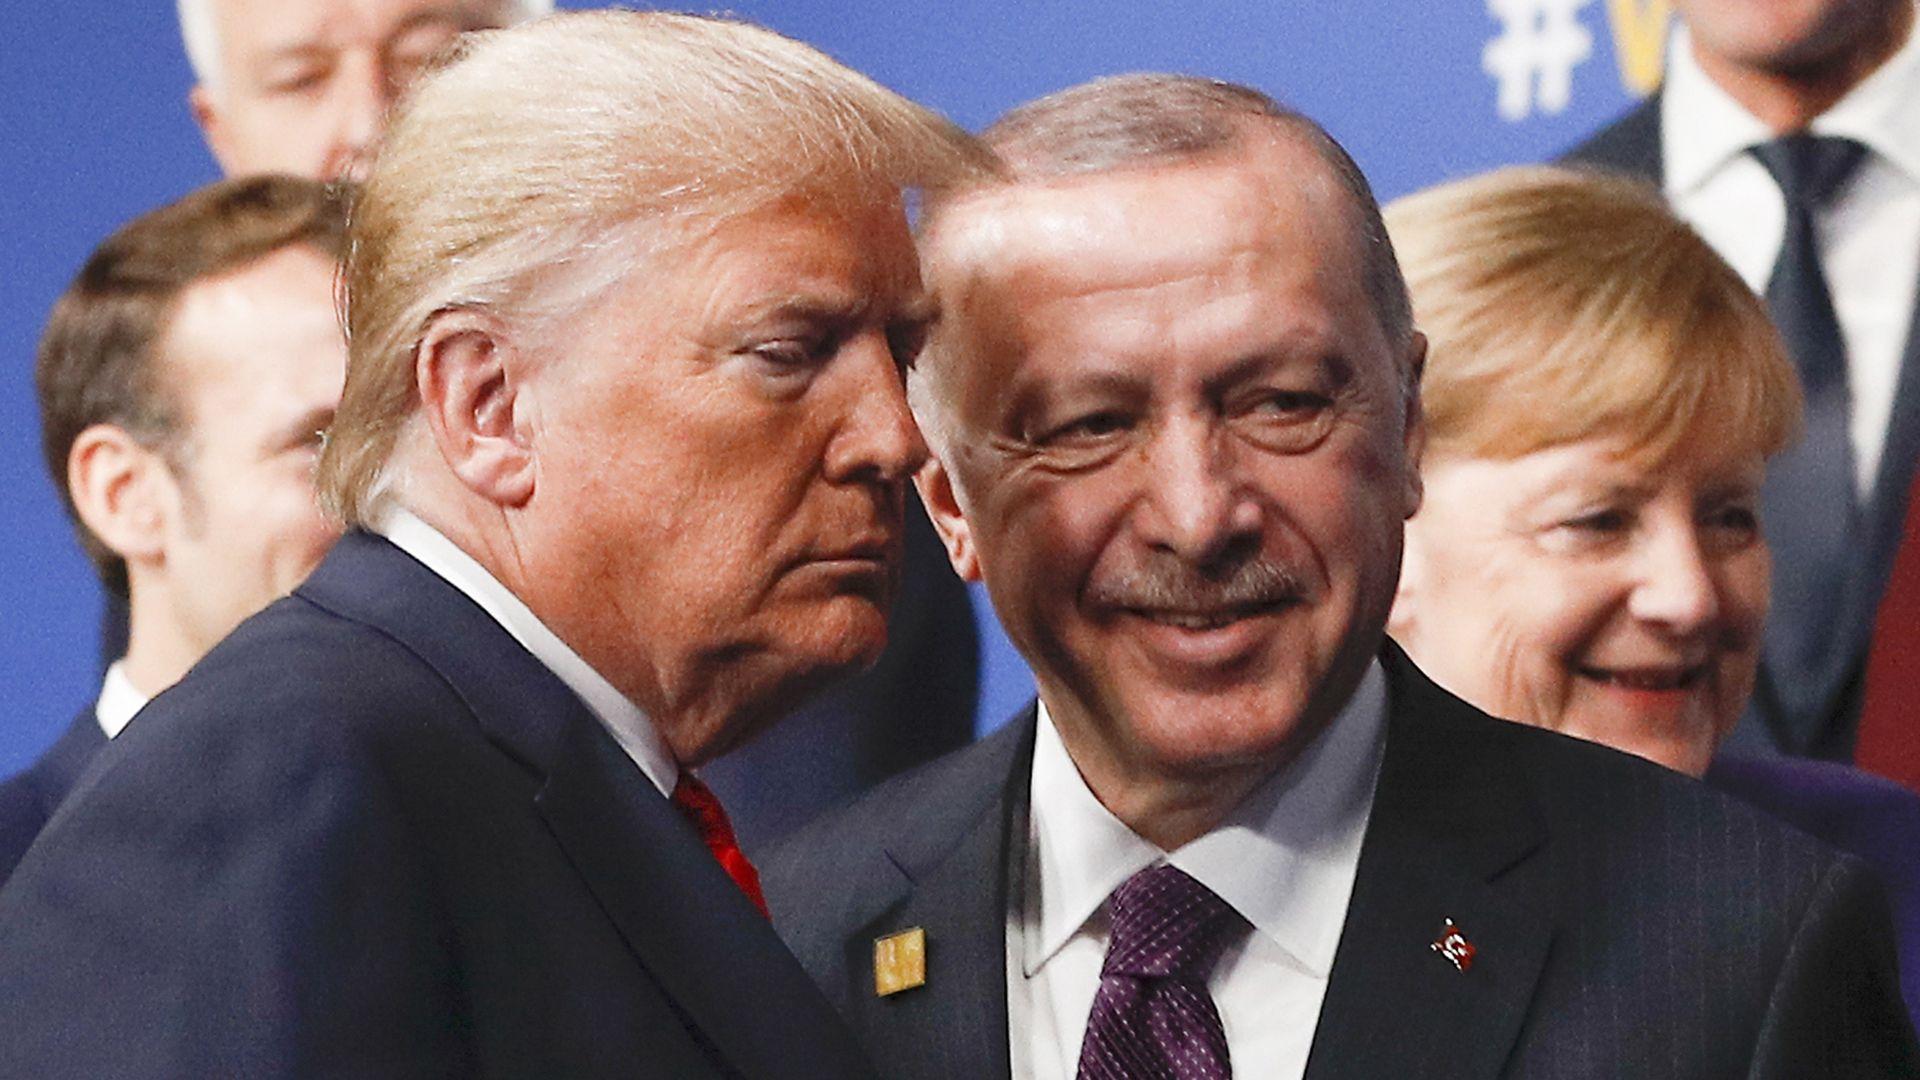 President Trump and Turkey's President Recep Tayyip Erdogan